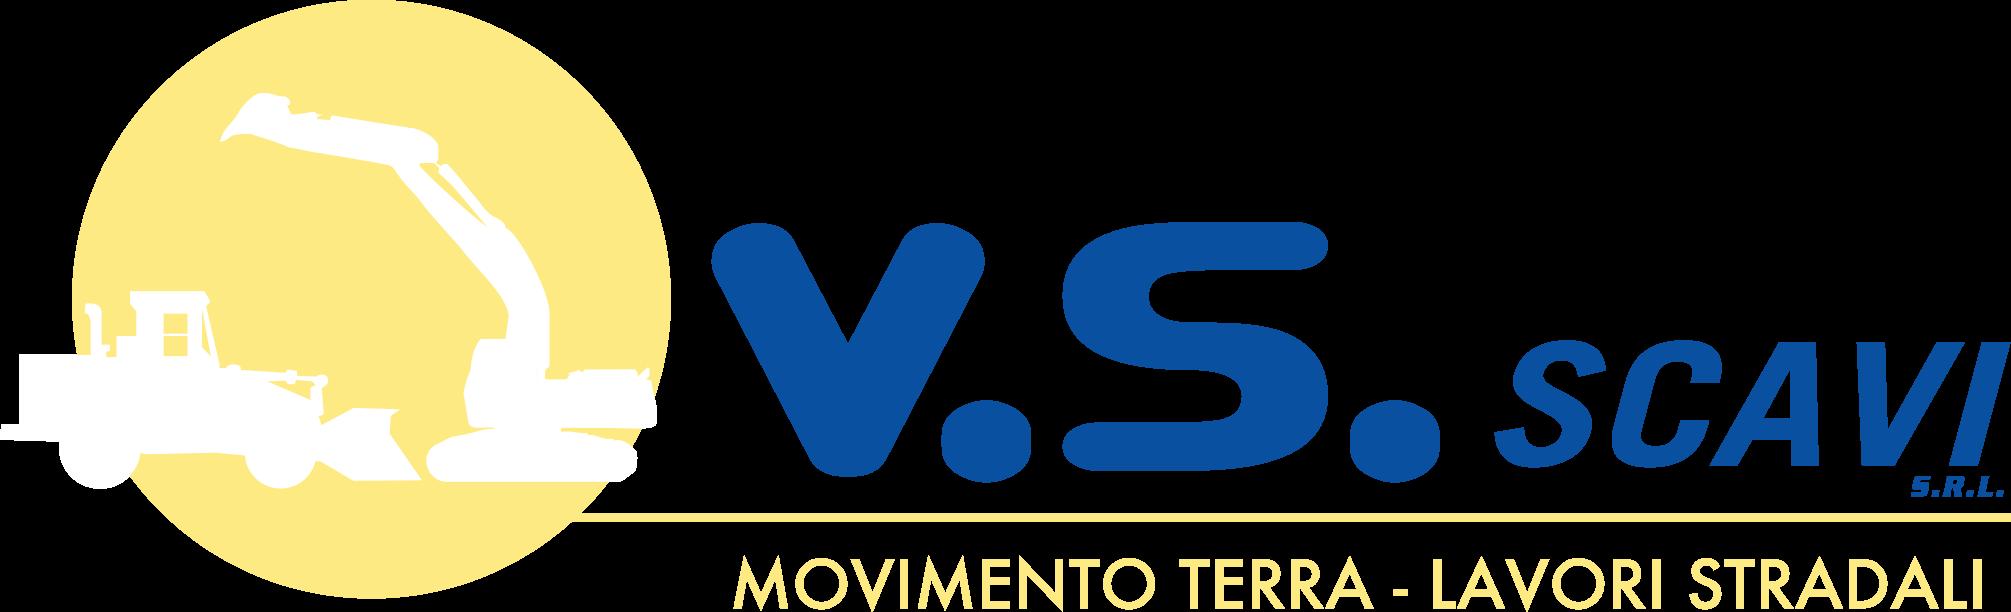 V.S.Scavi s.r.l.